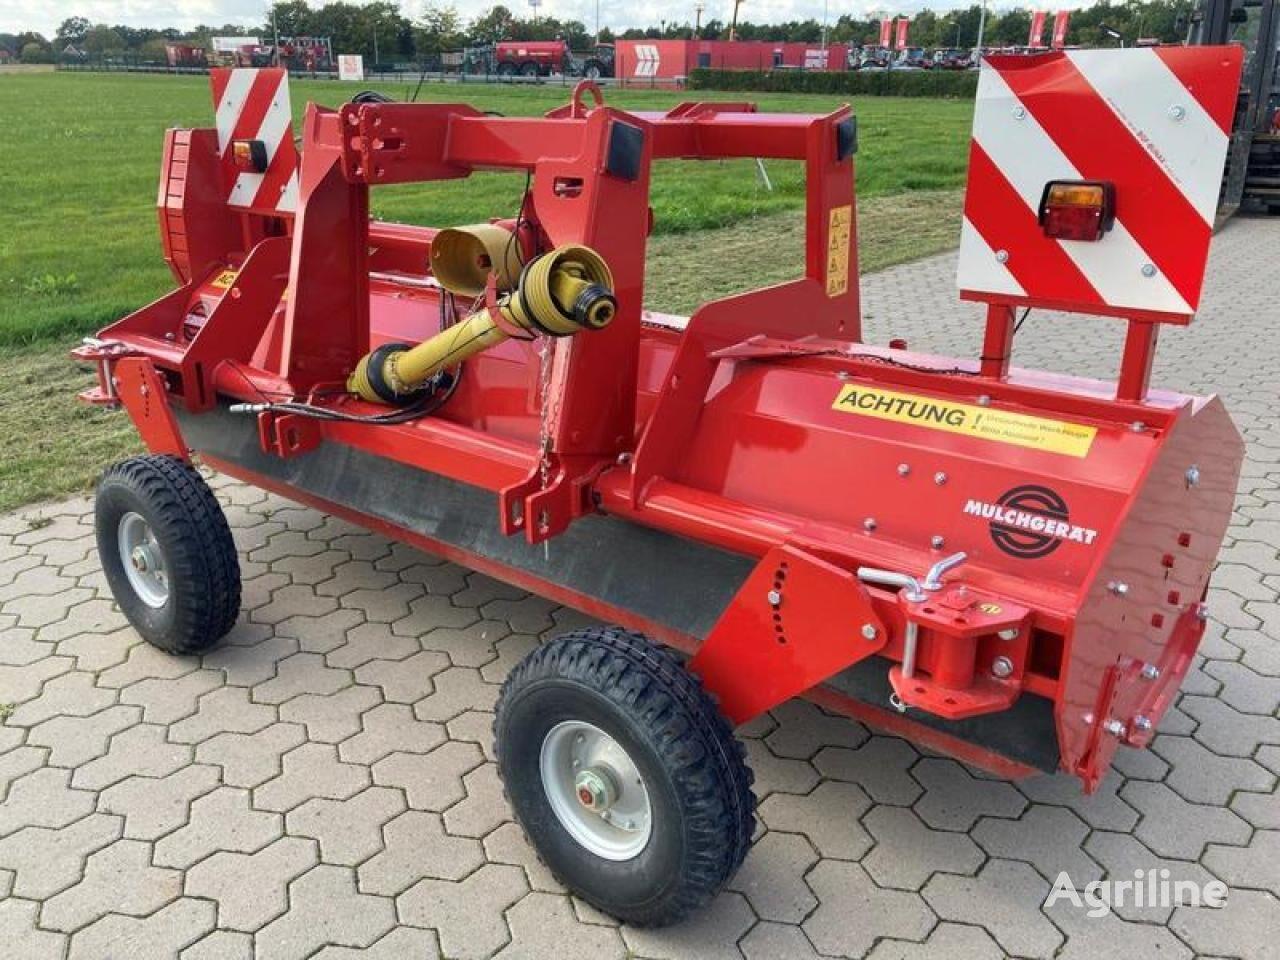 Sauerburger WM3300HF KARTOFFELKRAUT trituradora para tractor